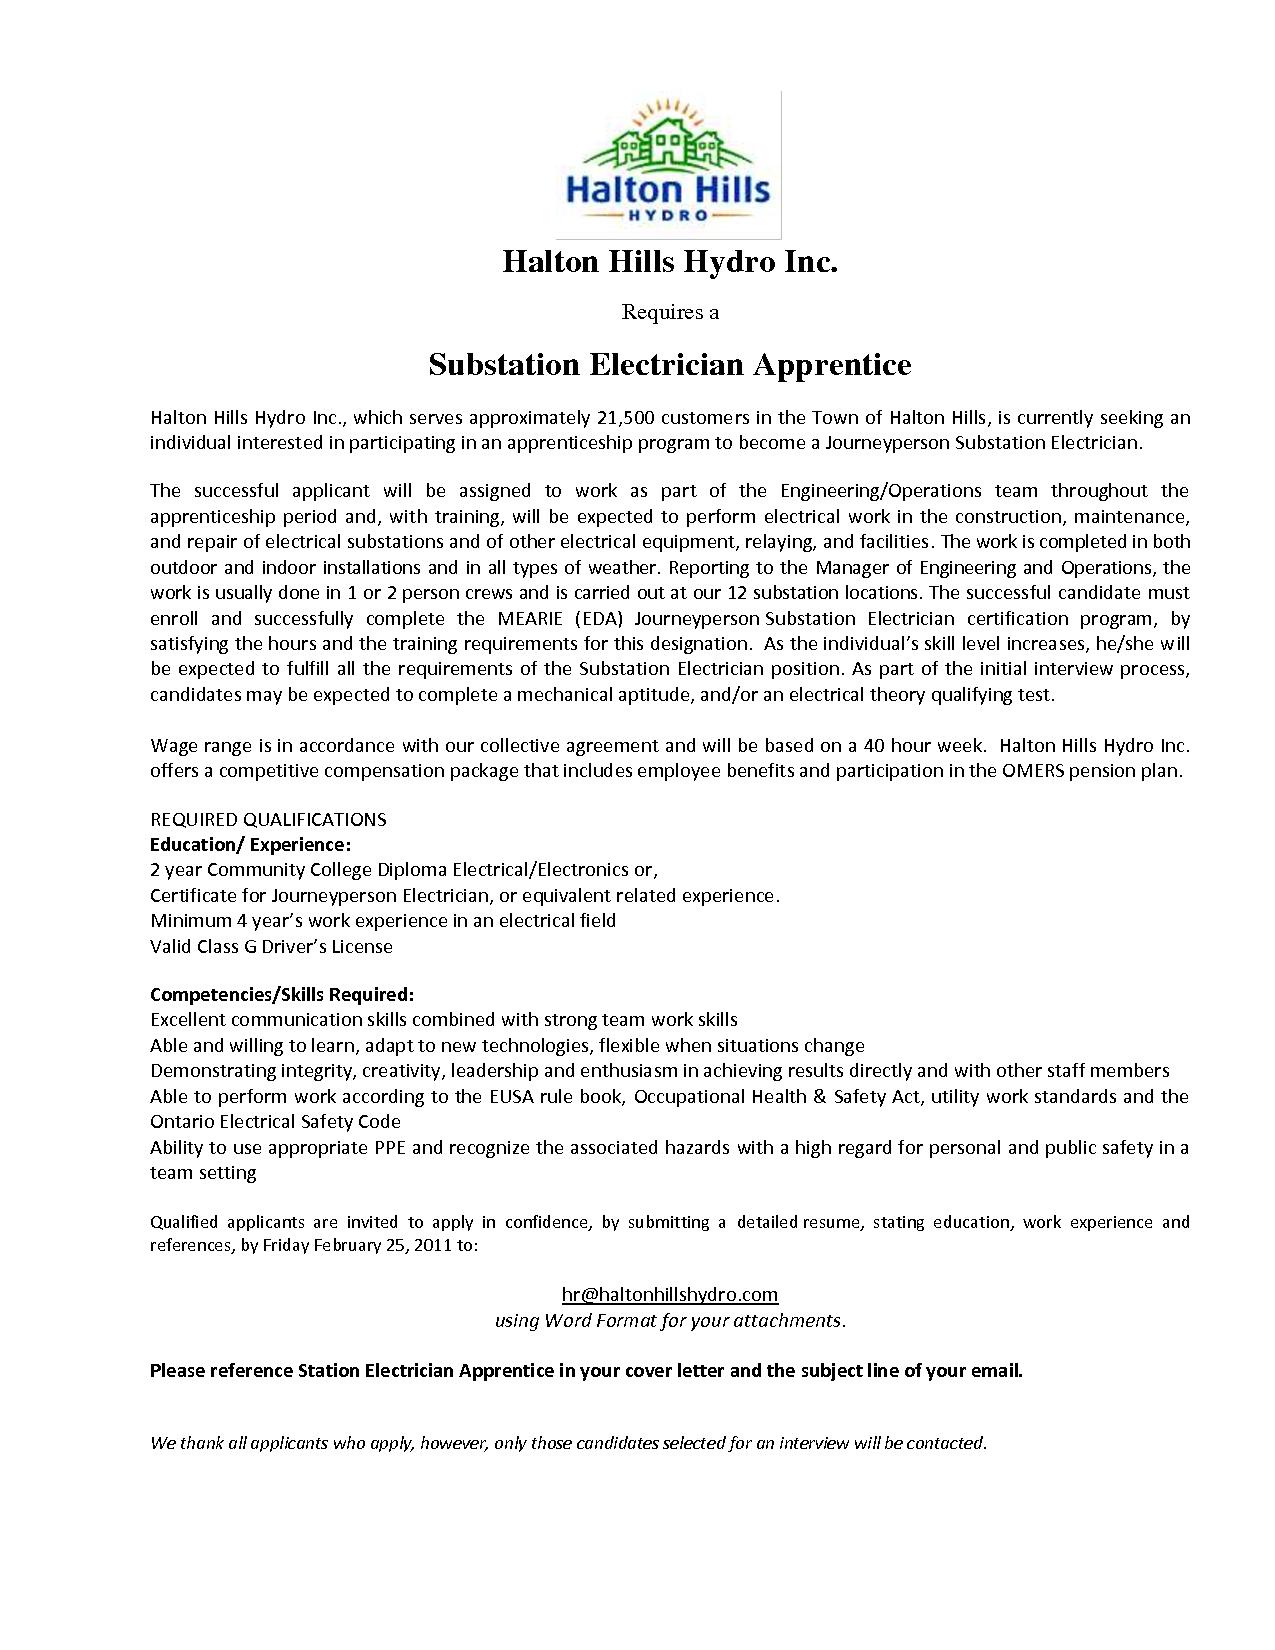 Electrician Apprentice Cover Letter Cover Latter Sample